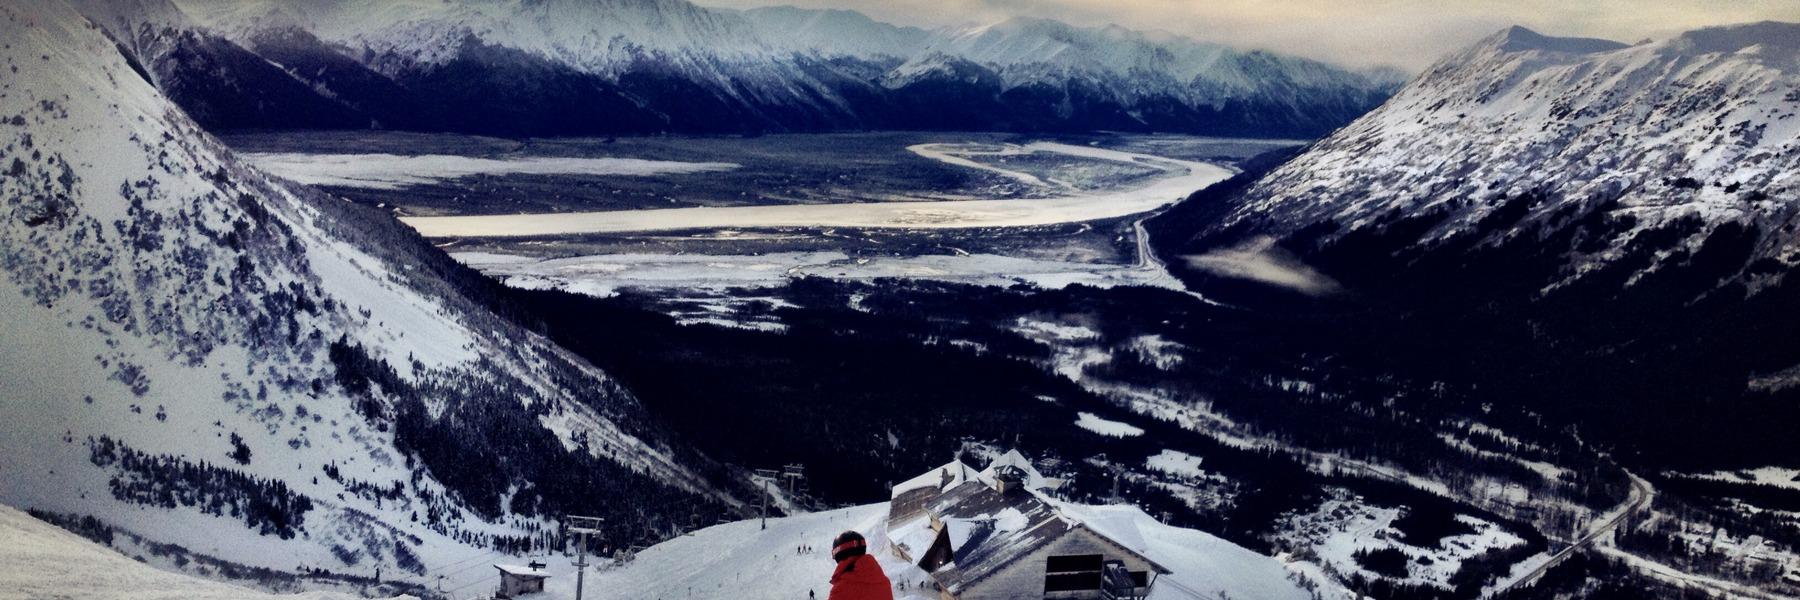 Ski Vacation Package - Alyeska, Alaska